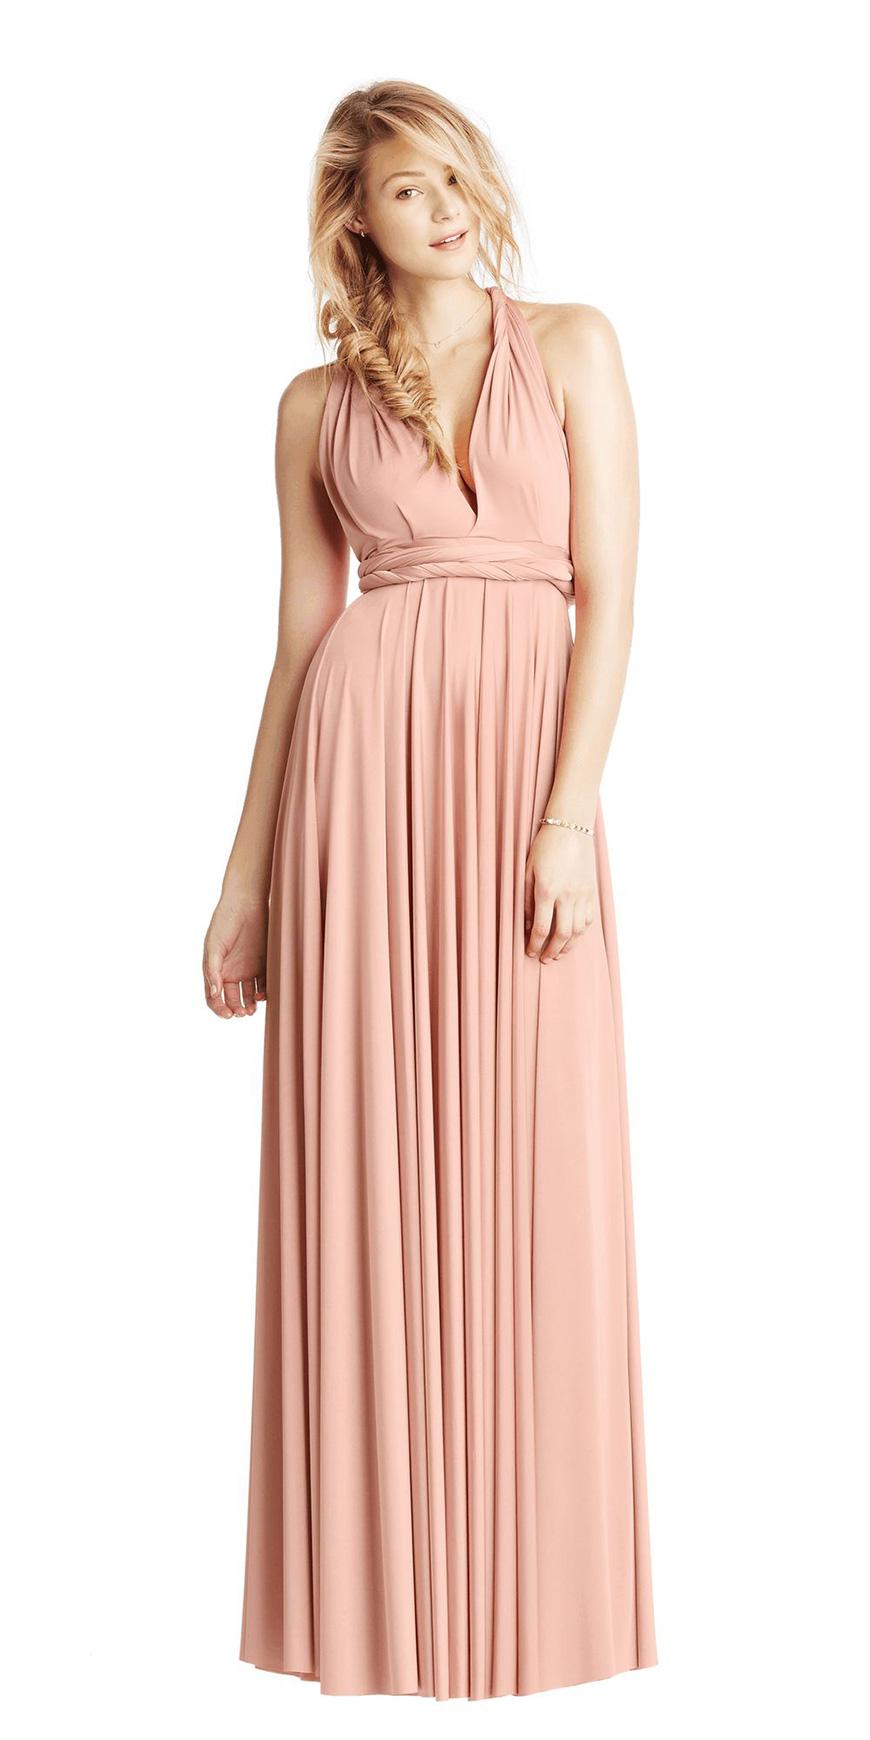 Blush Wedding Dress Grey Bridesmaids : Blush bridesmaid dresses wedding ideas by colour chwv